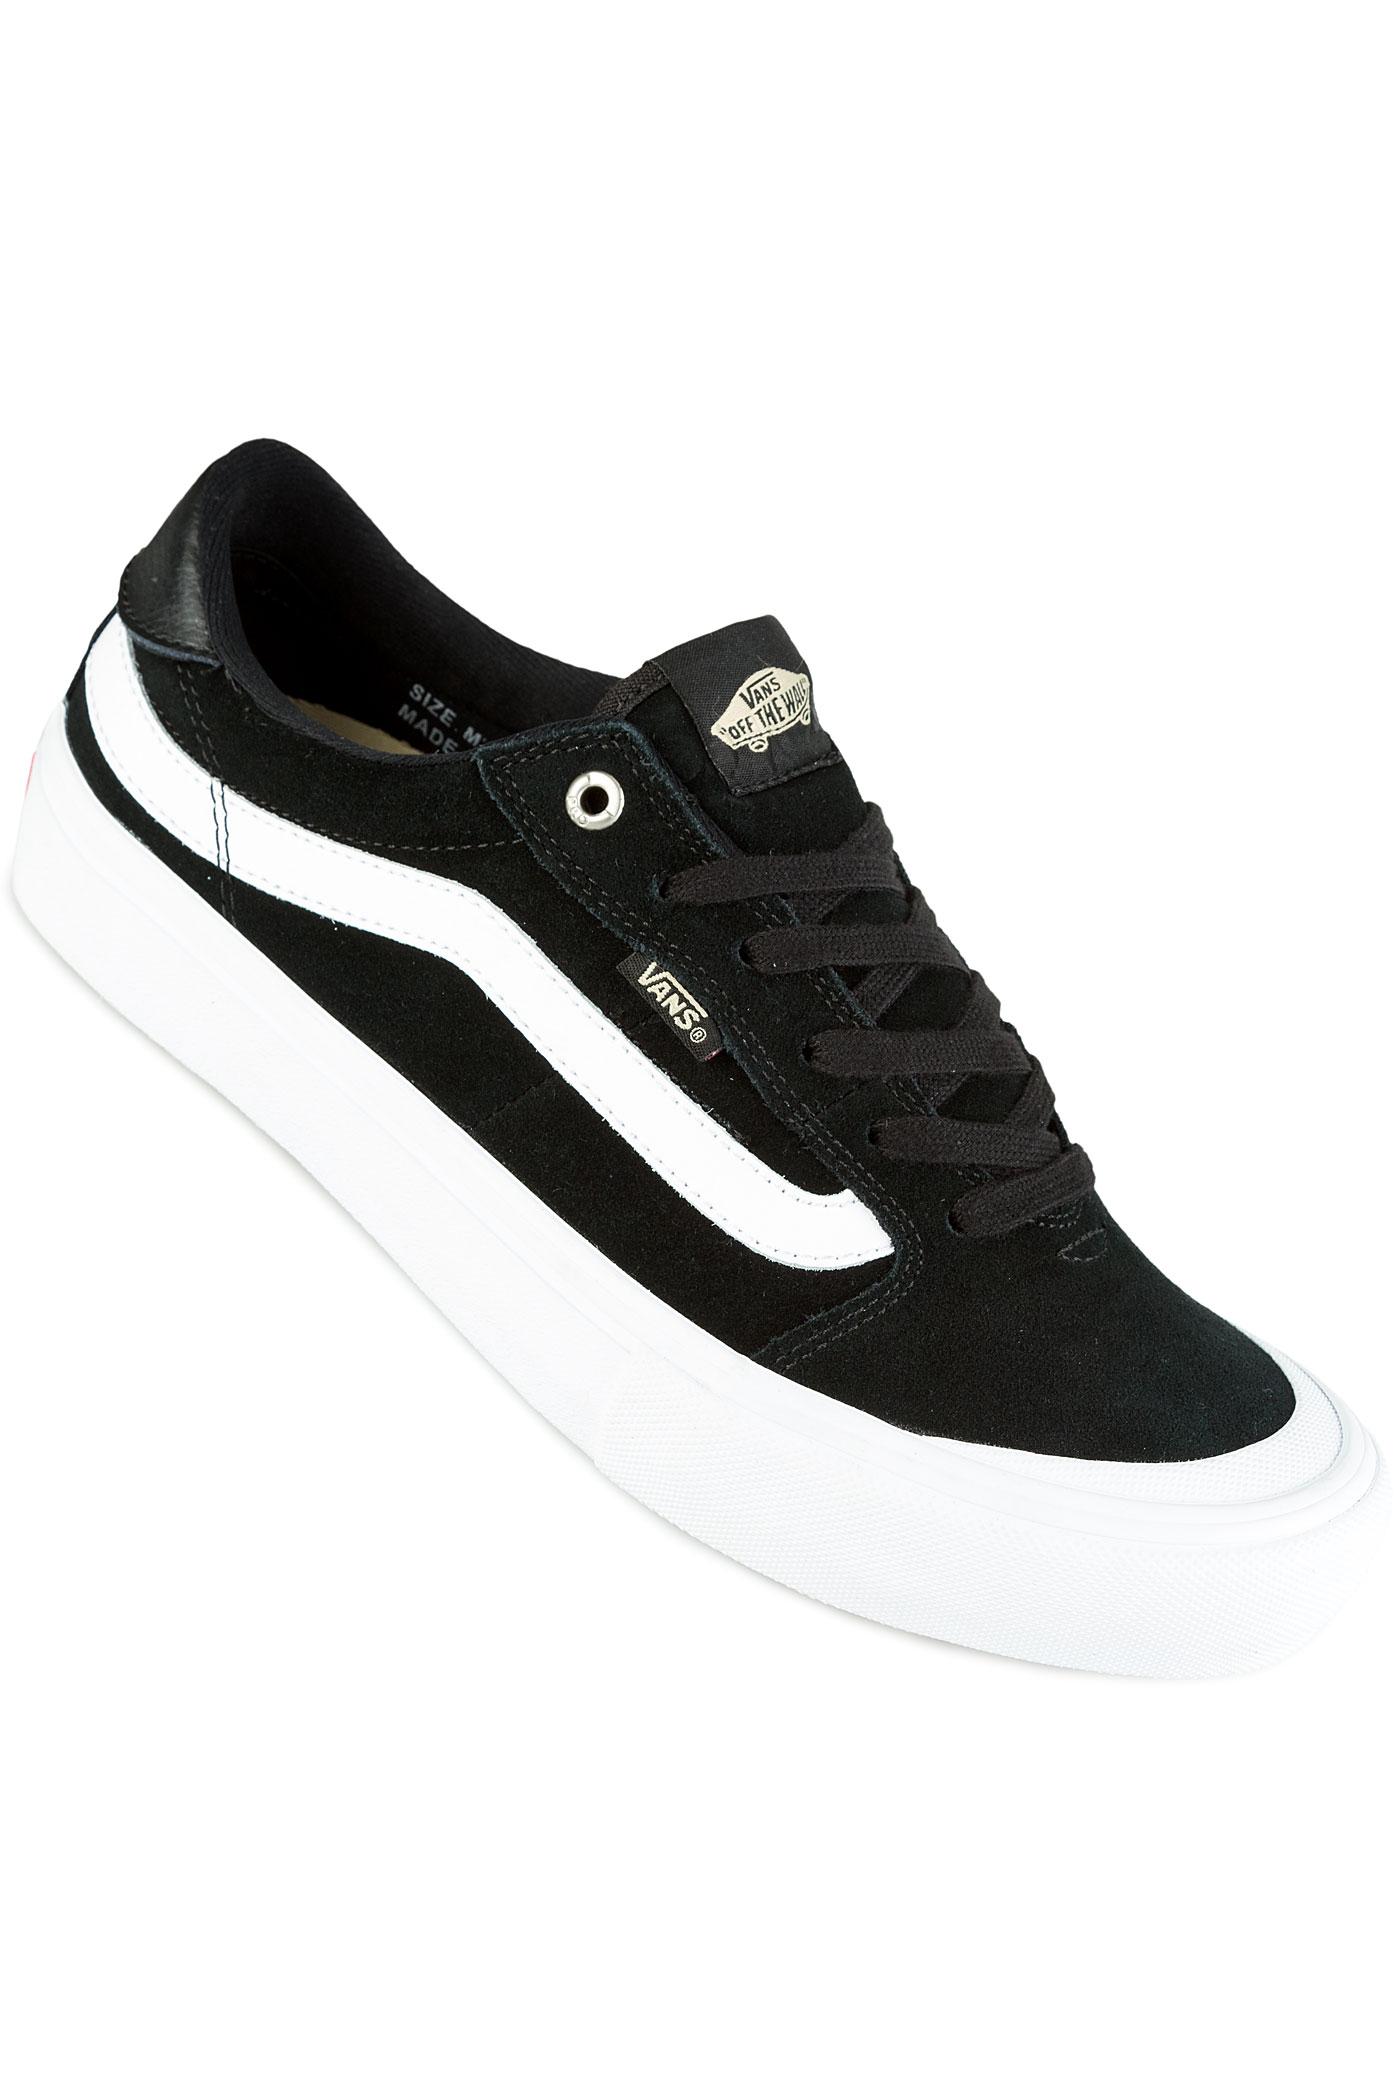 Vans style 112  negro